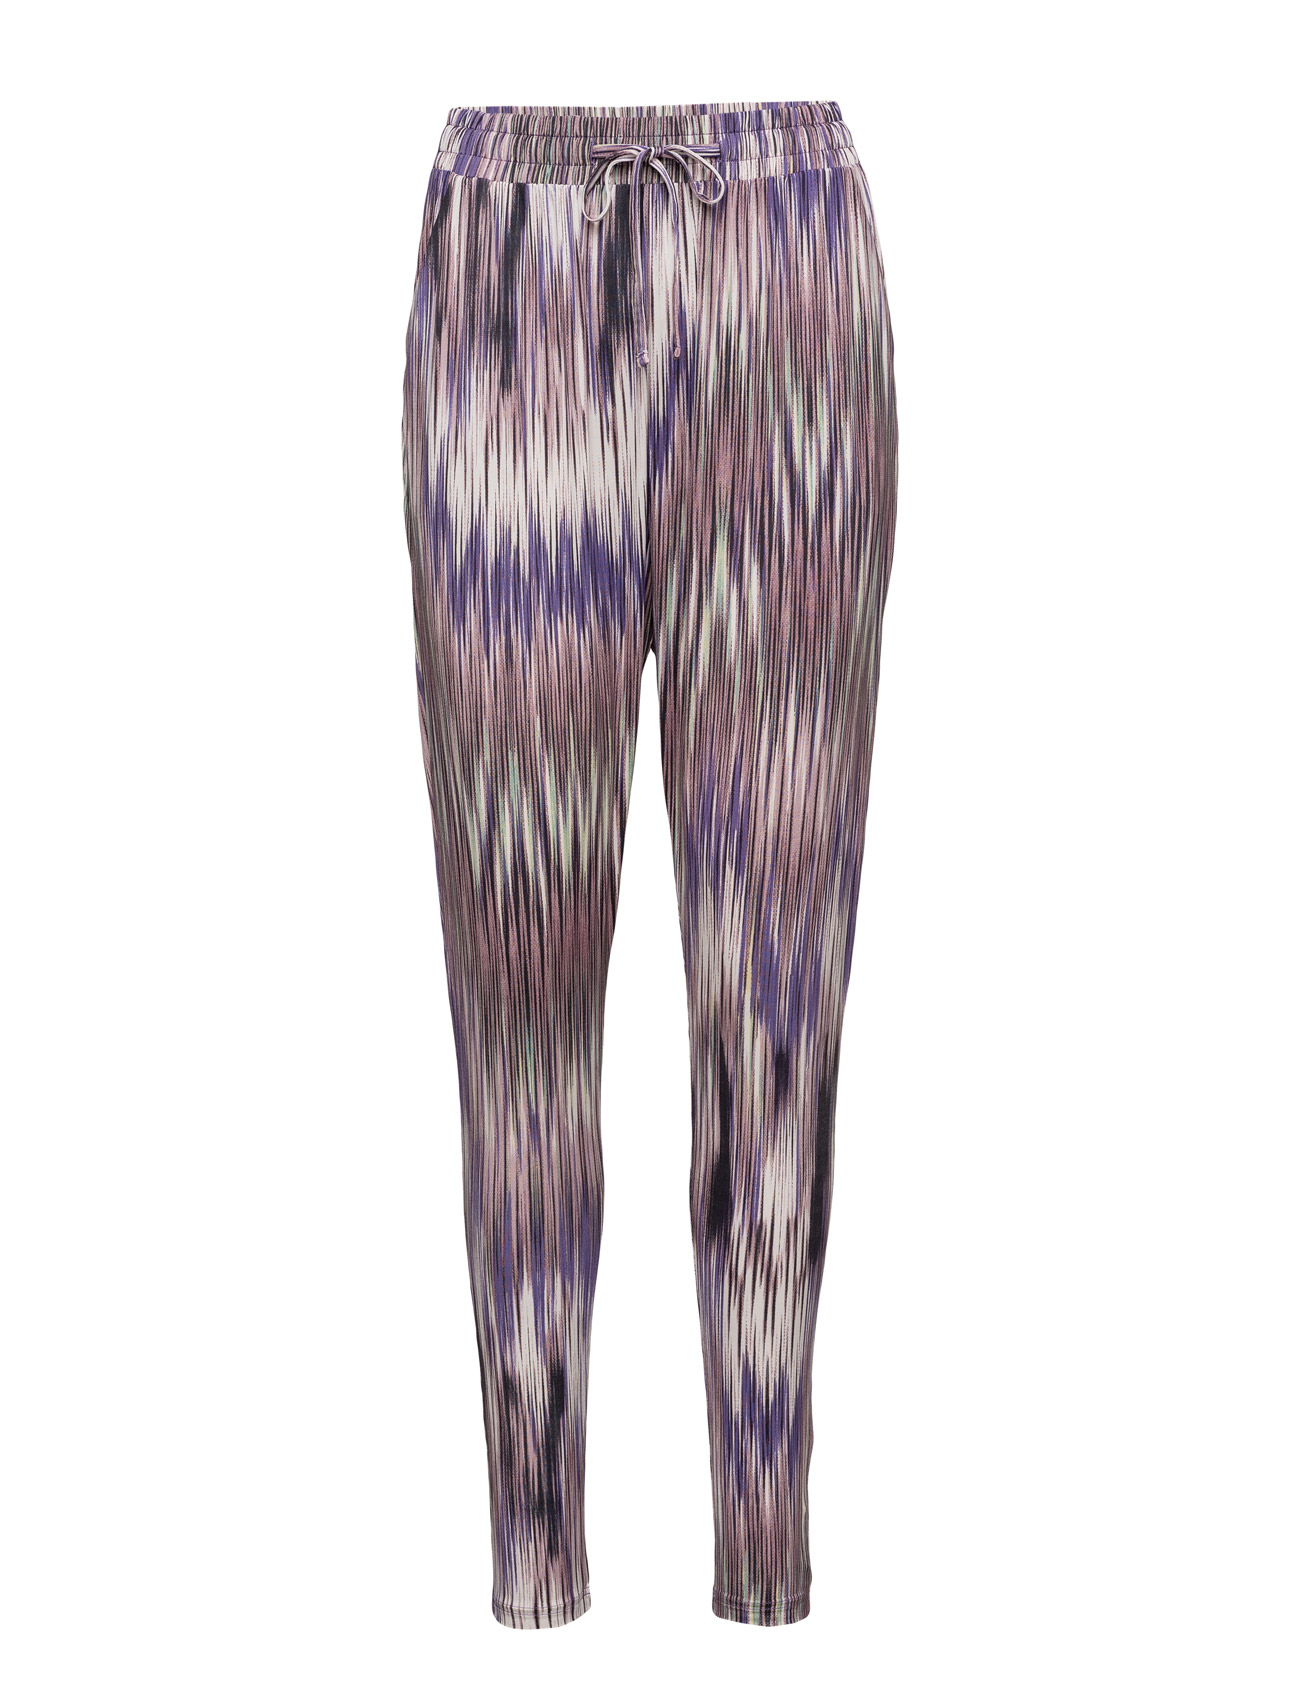 Womens Loose Pants Ilse Jacobsen Casual bukser til Kvinder i Iris